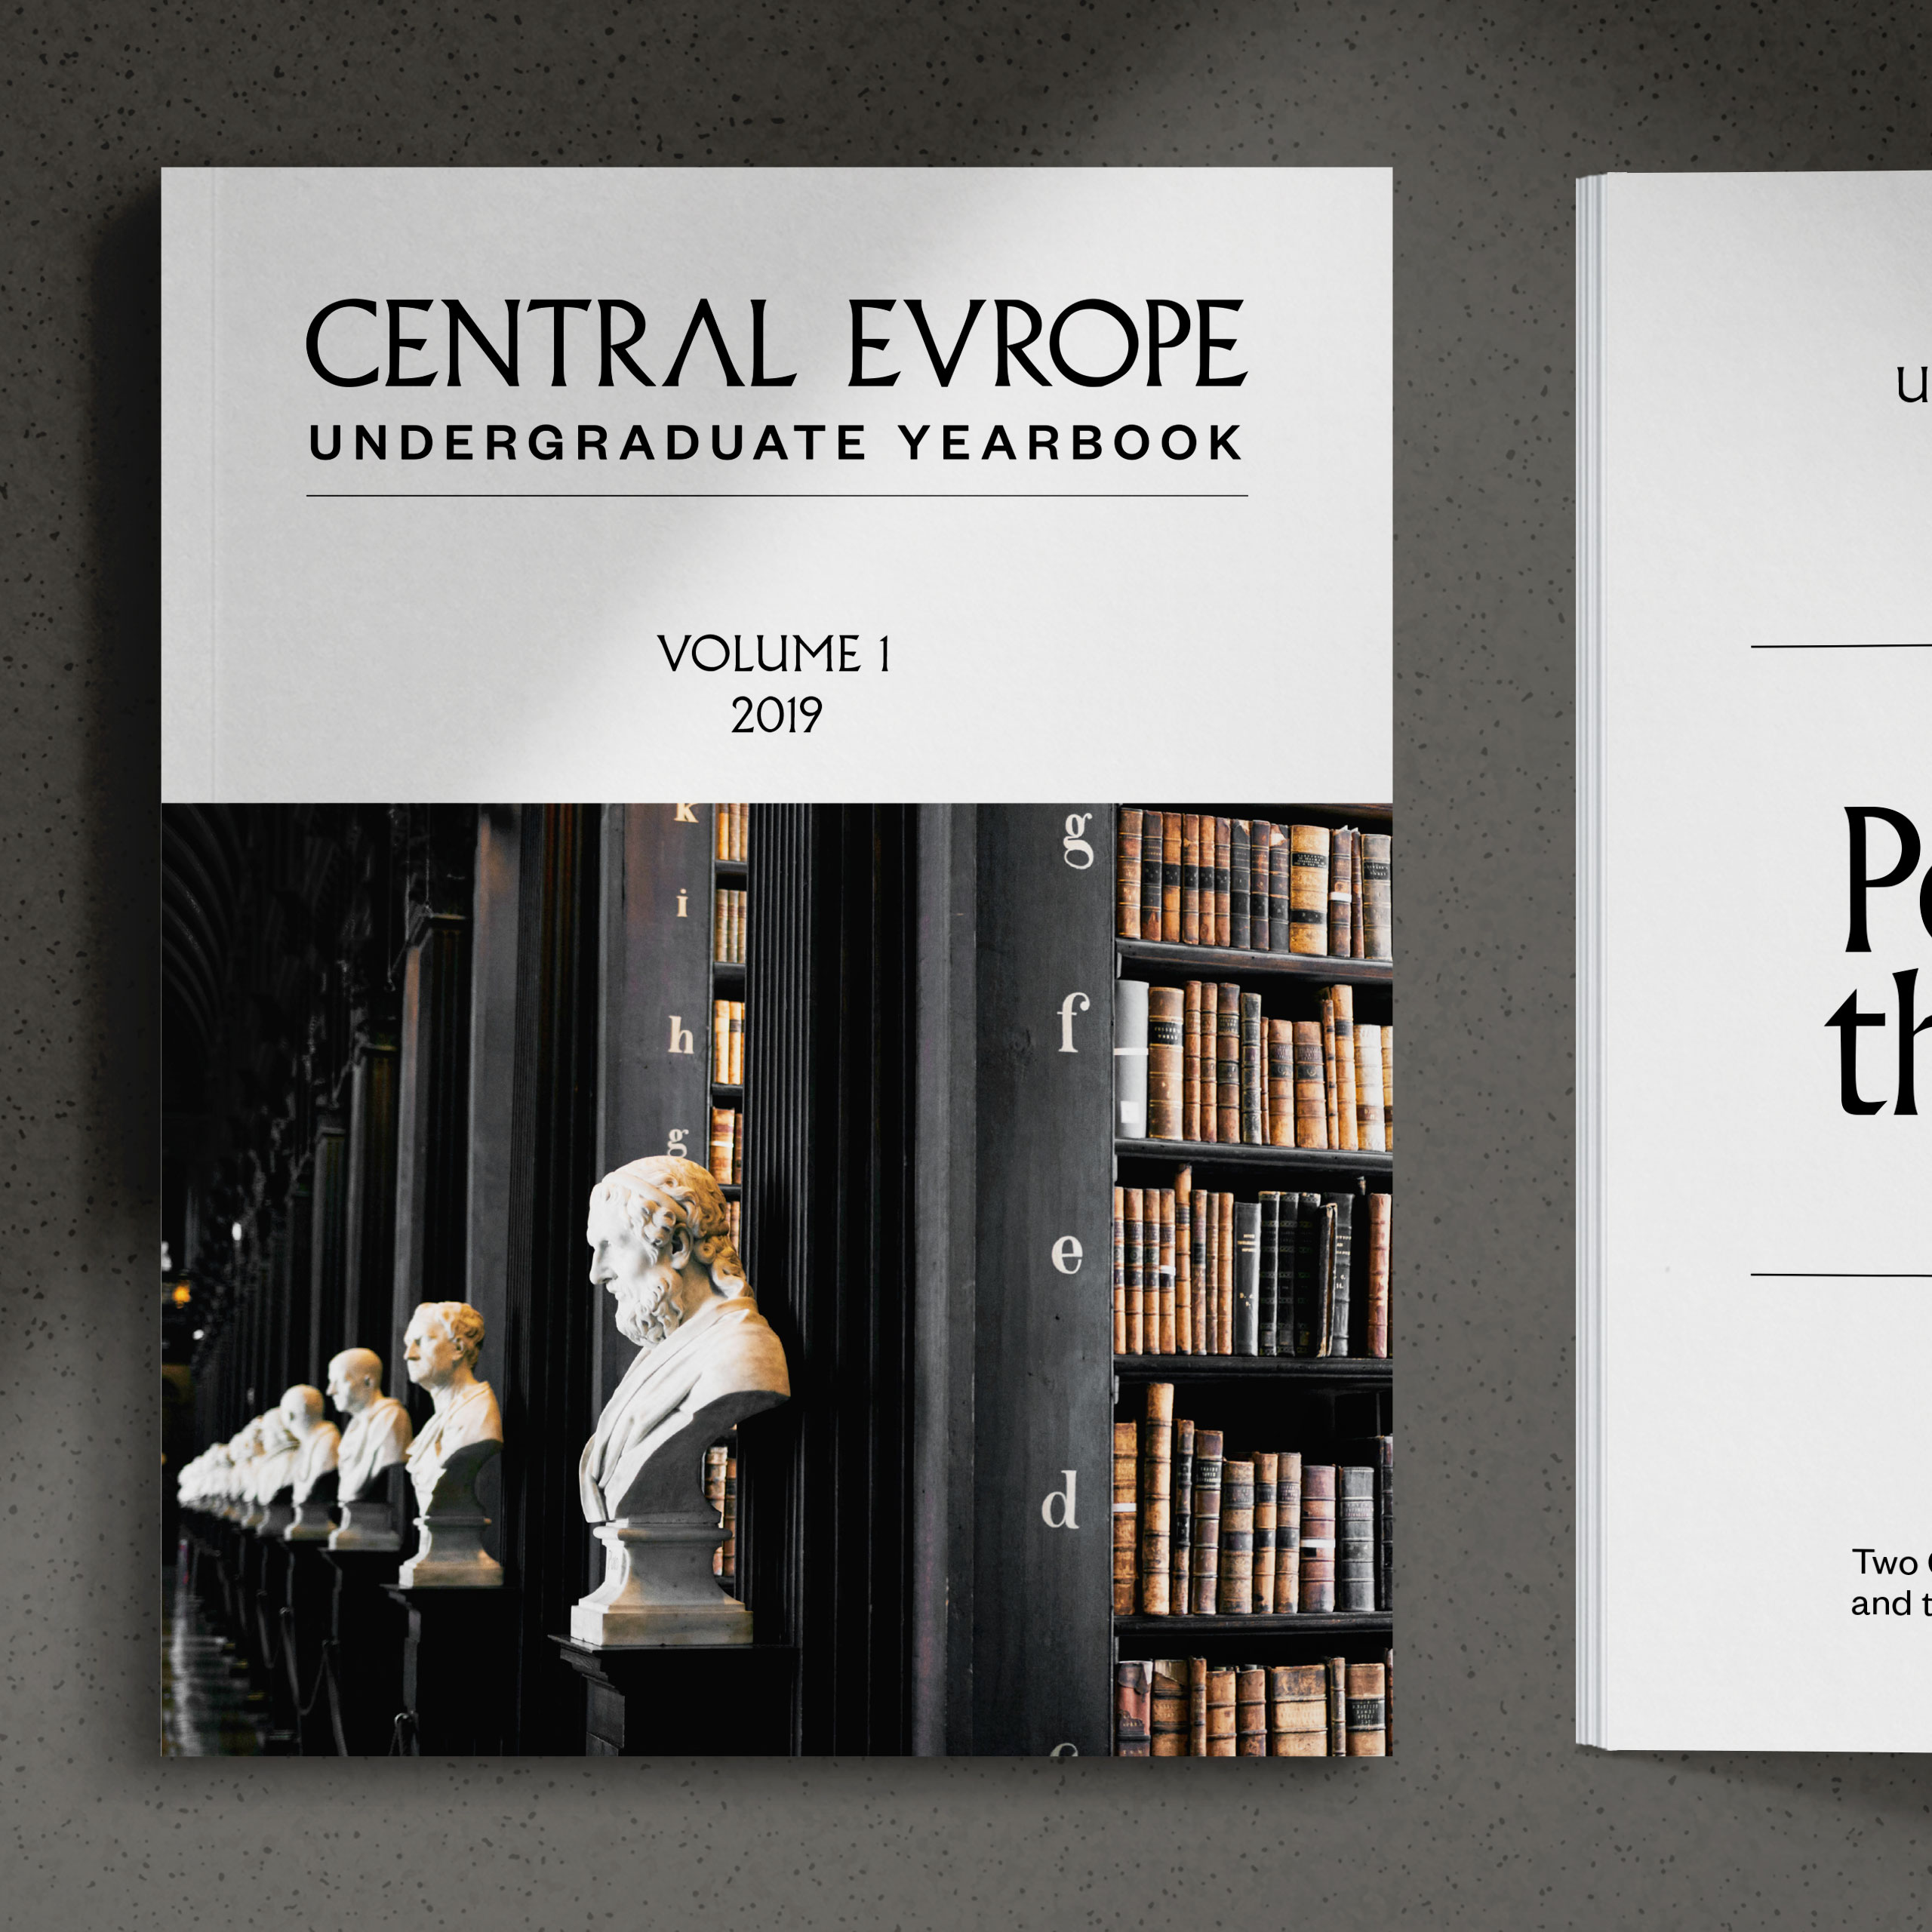 Central Europe Undergraduate Yearbook ↗